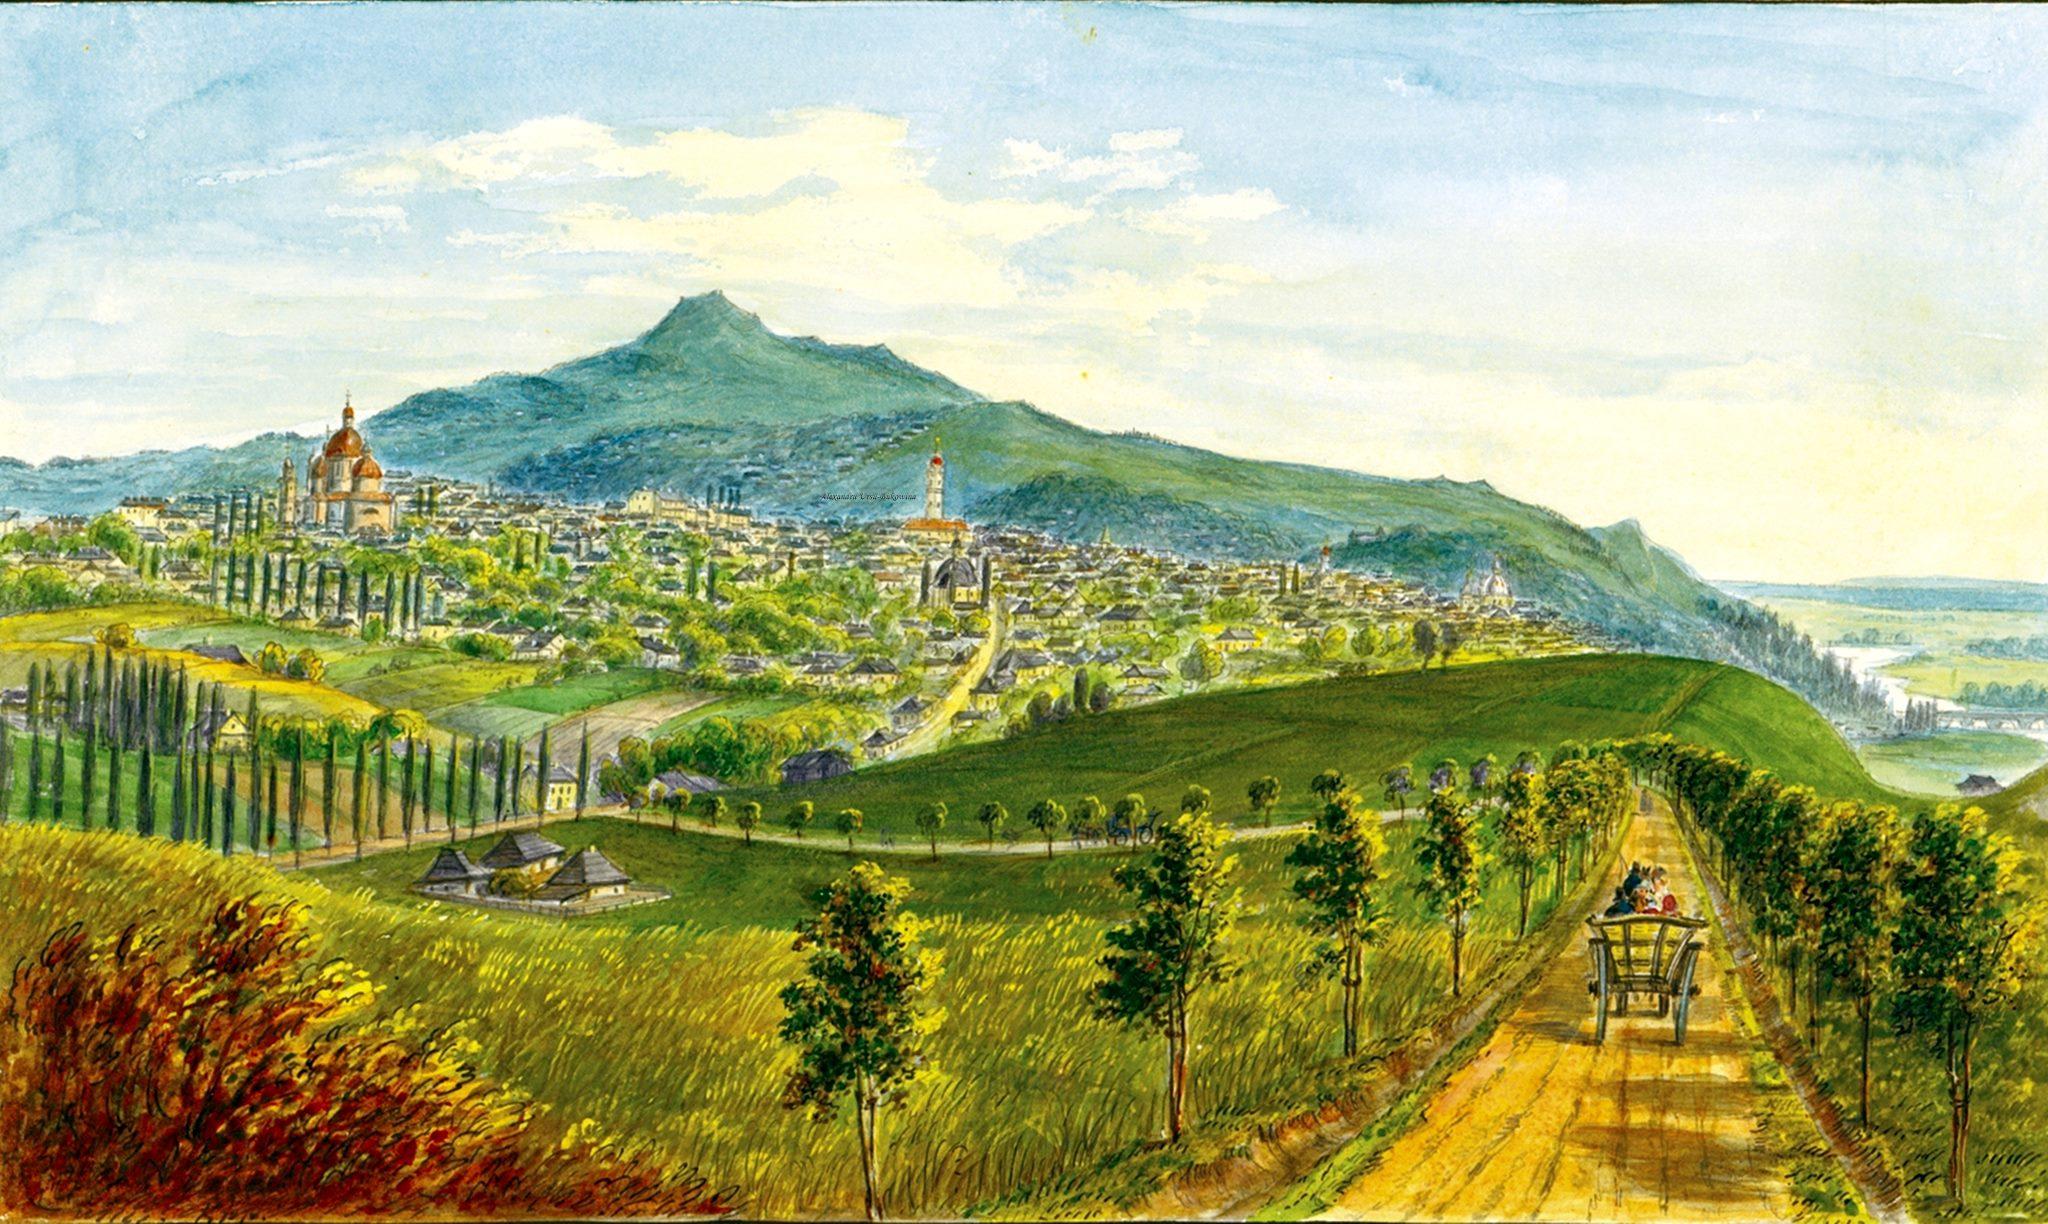 Oameni si locuri din Bucovina.Landes Haupt Stadt Czernowitz.1867.Franz Xavier Knapp(1809-1883).